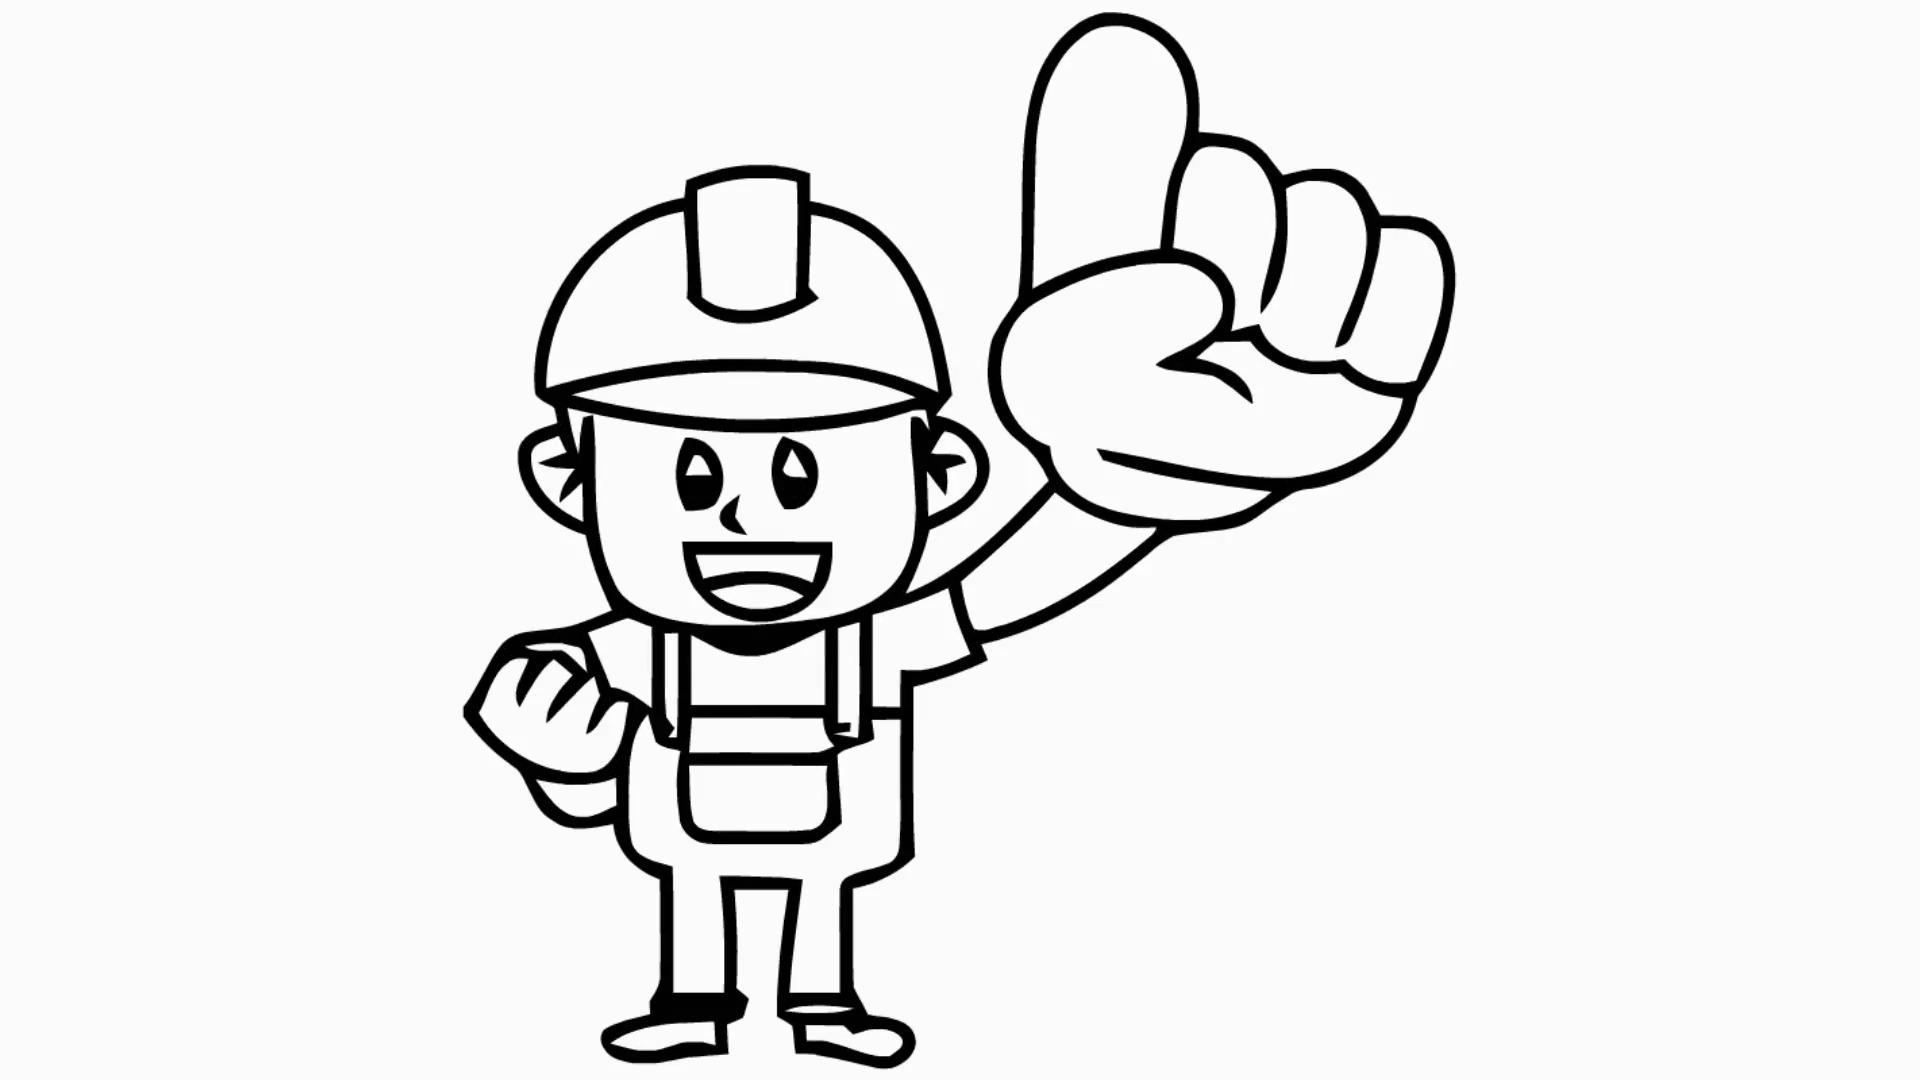 Drawn microphone animated Illustration man drawn drawn